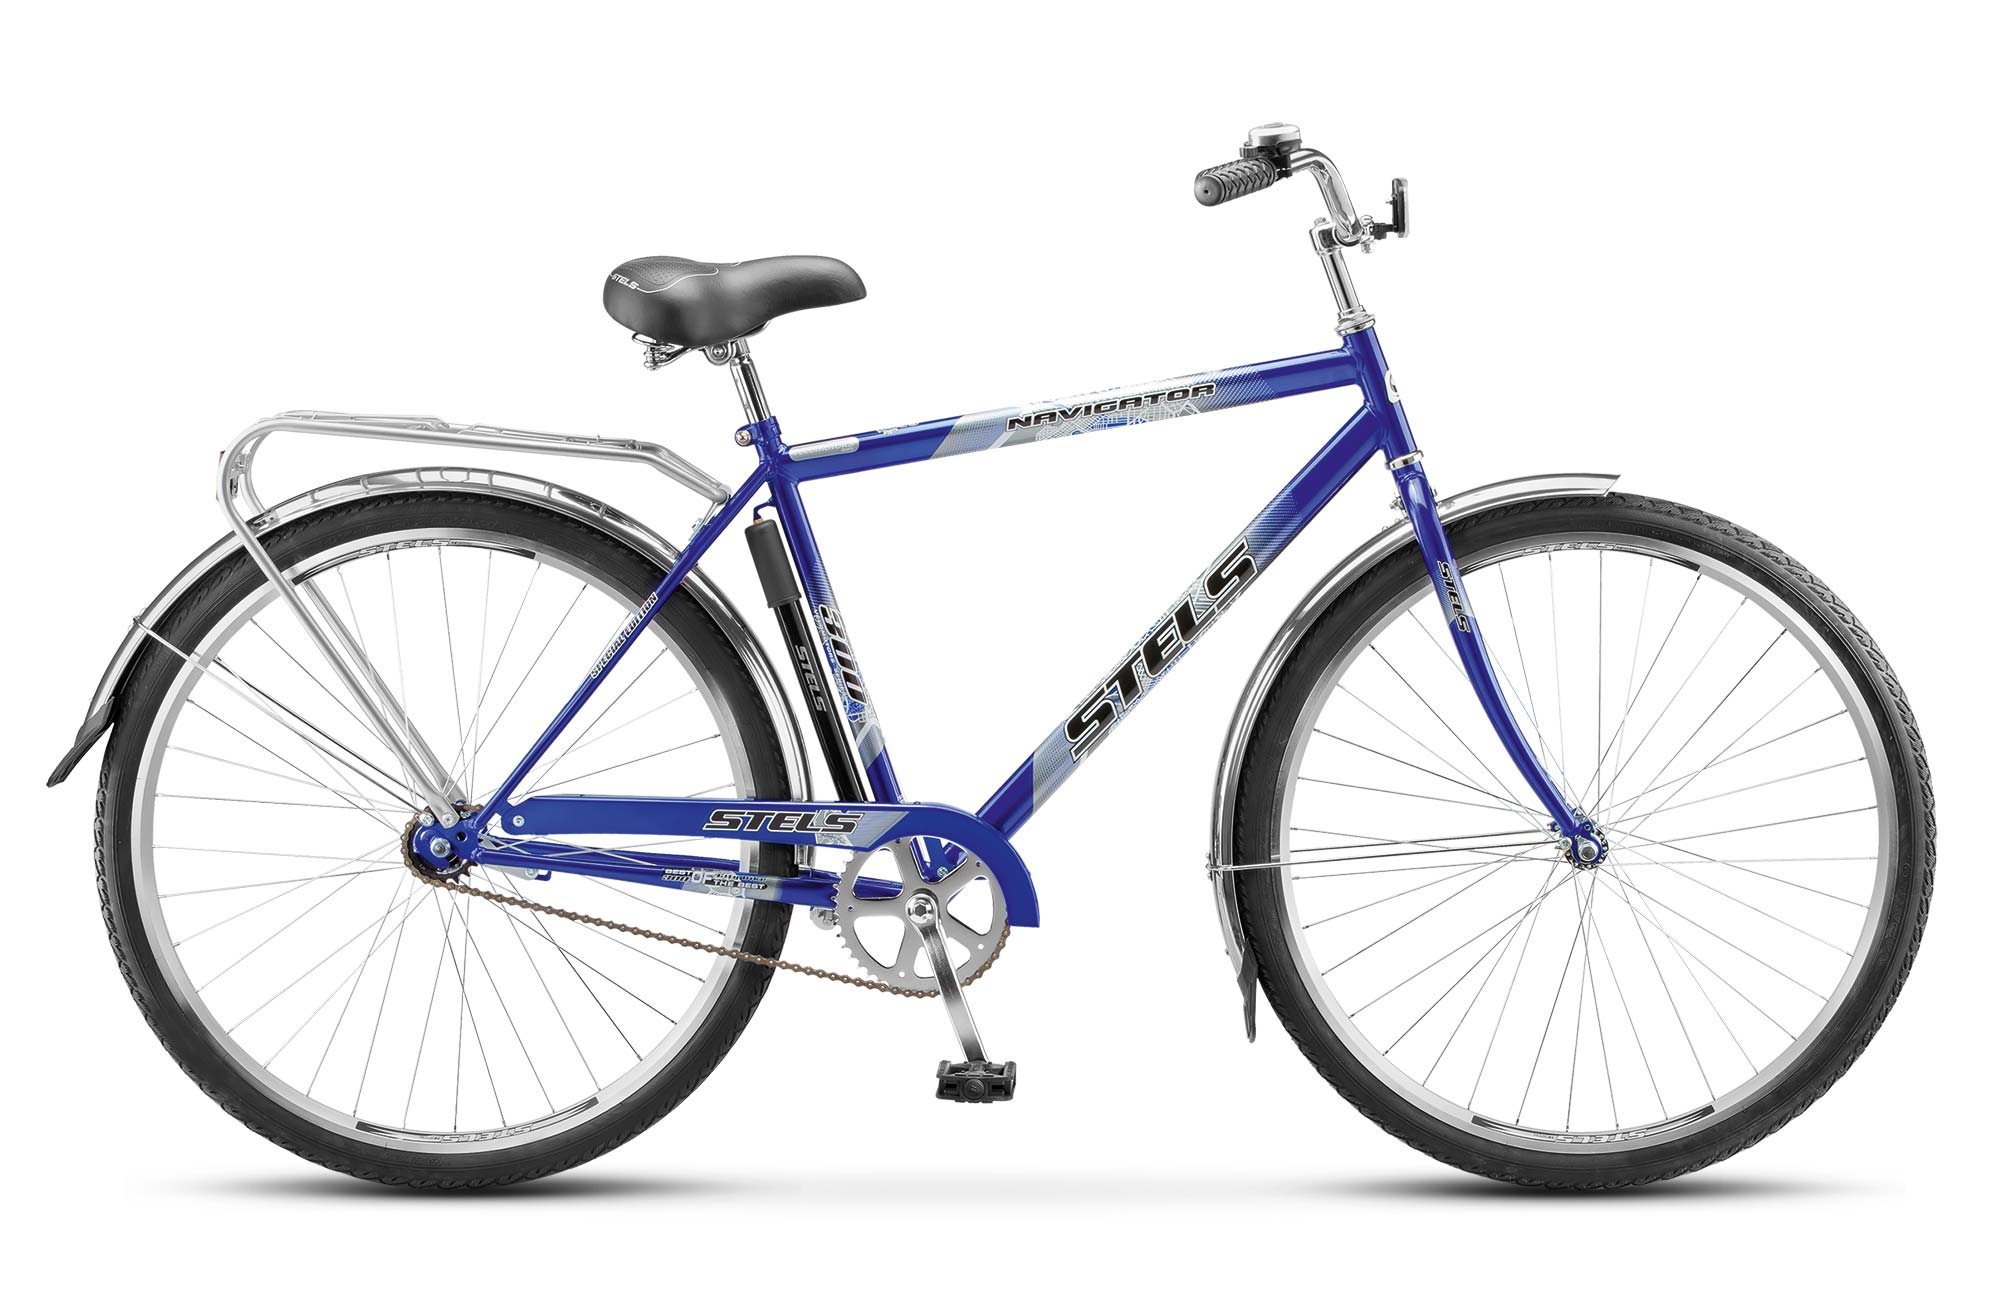 STELS Велосипед Stels Navigator 300 Gent 28 (2016) синий 20 велосипед stels navigator 310 gent 2017